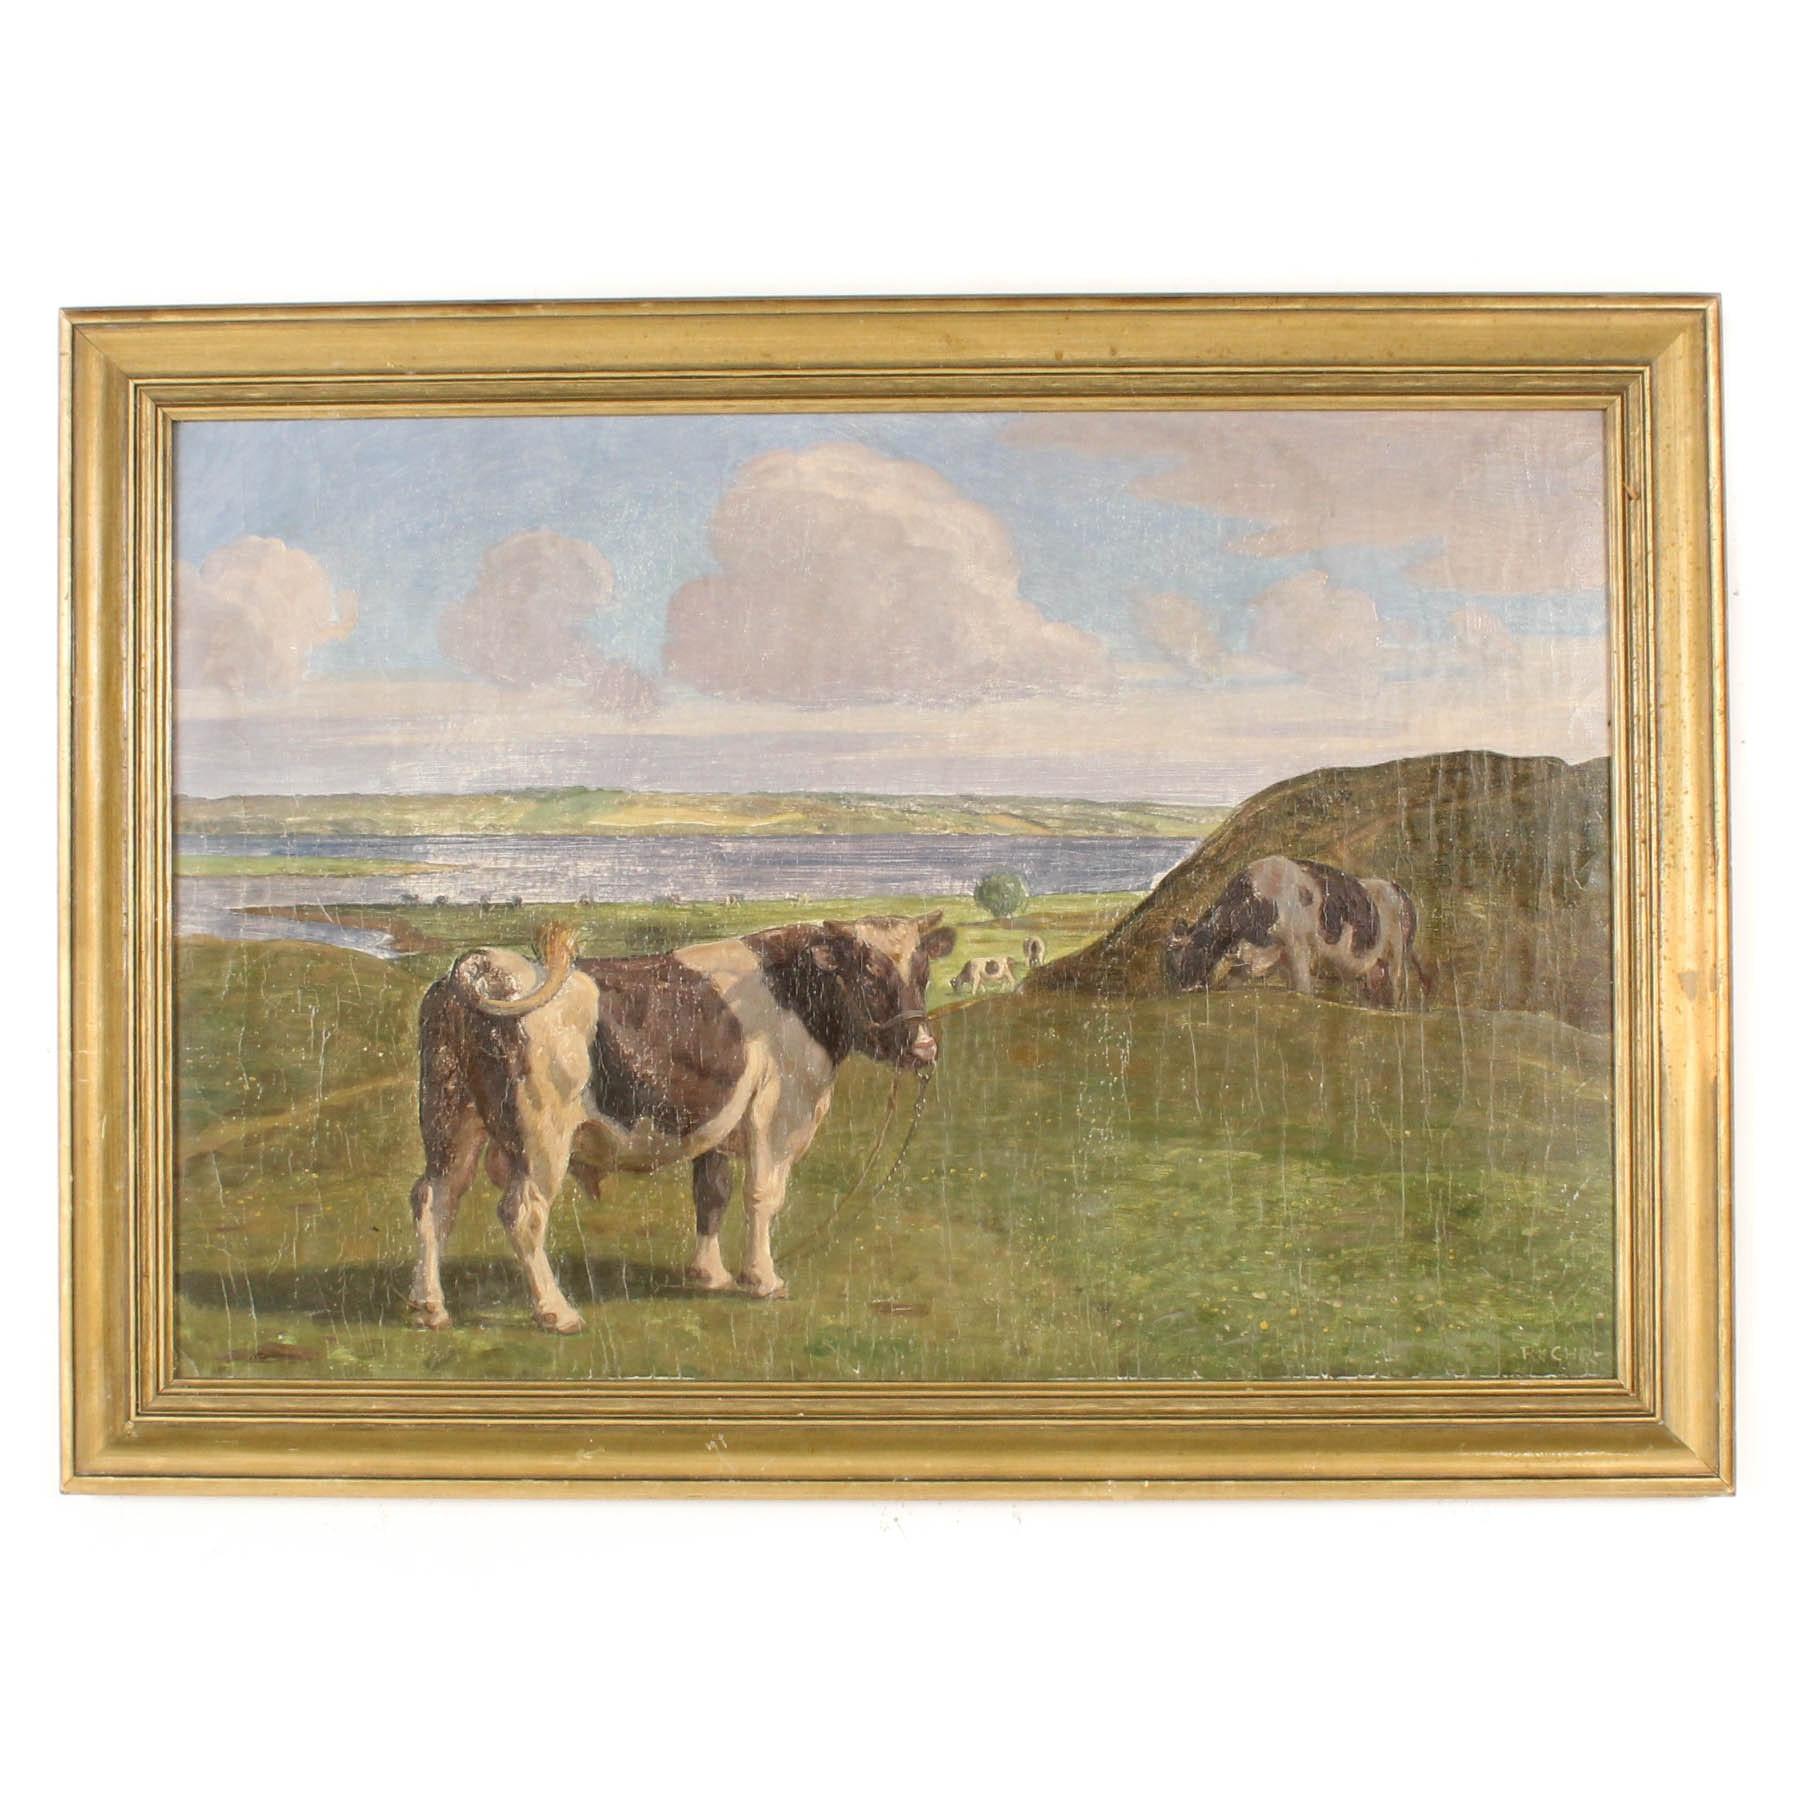 1926 Bucolic Landscape Oil Painting